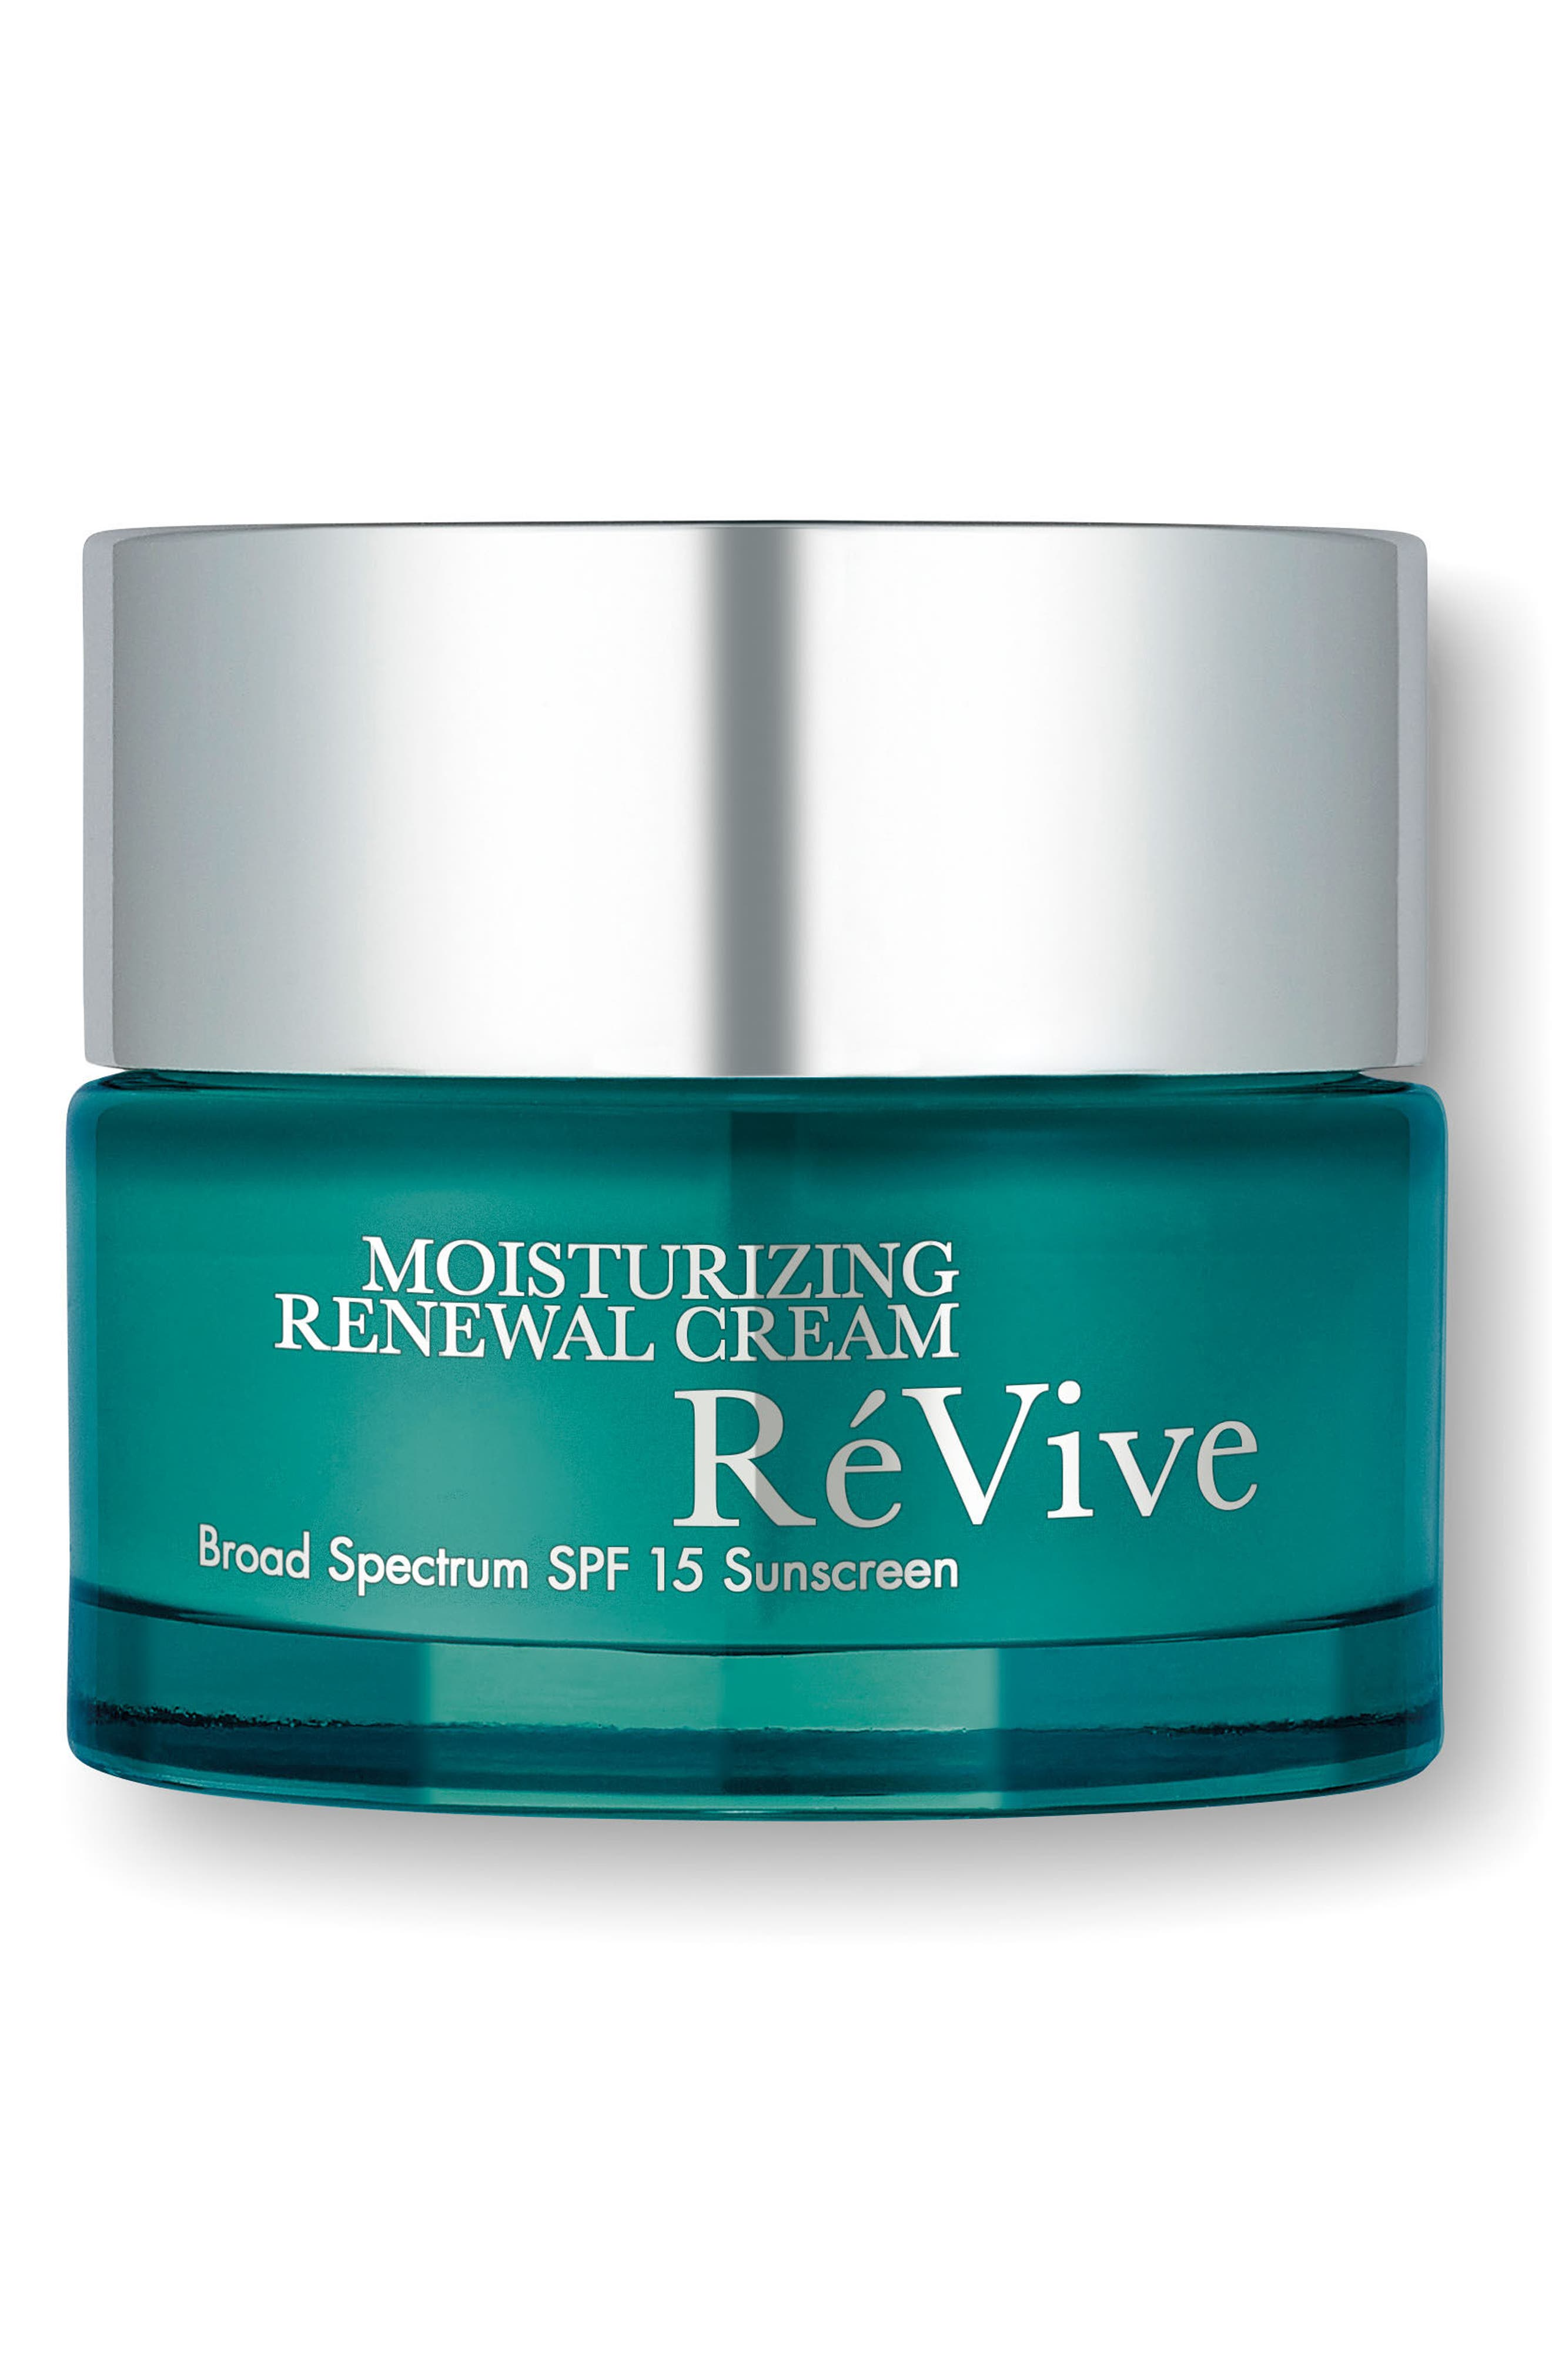 Alternate Image 1 Selected - RéVive® Moisturizing Renewal Cream Broad Spectrum SPF 15 Sunscreen